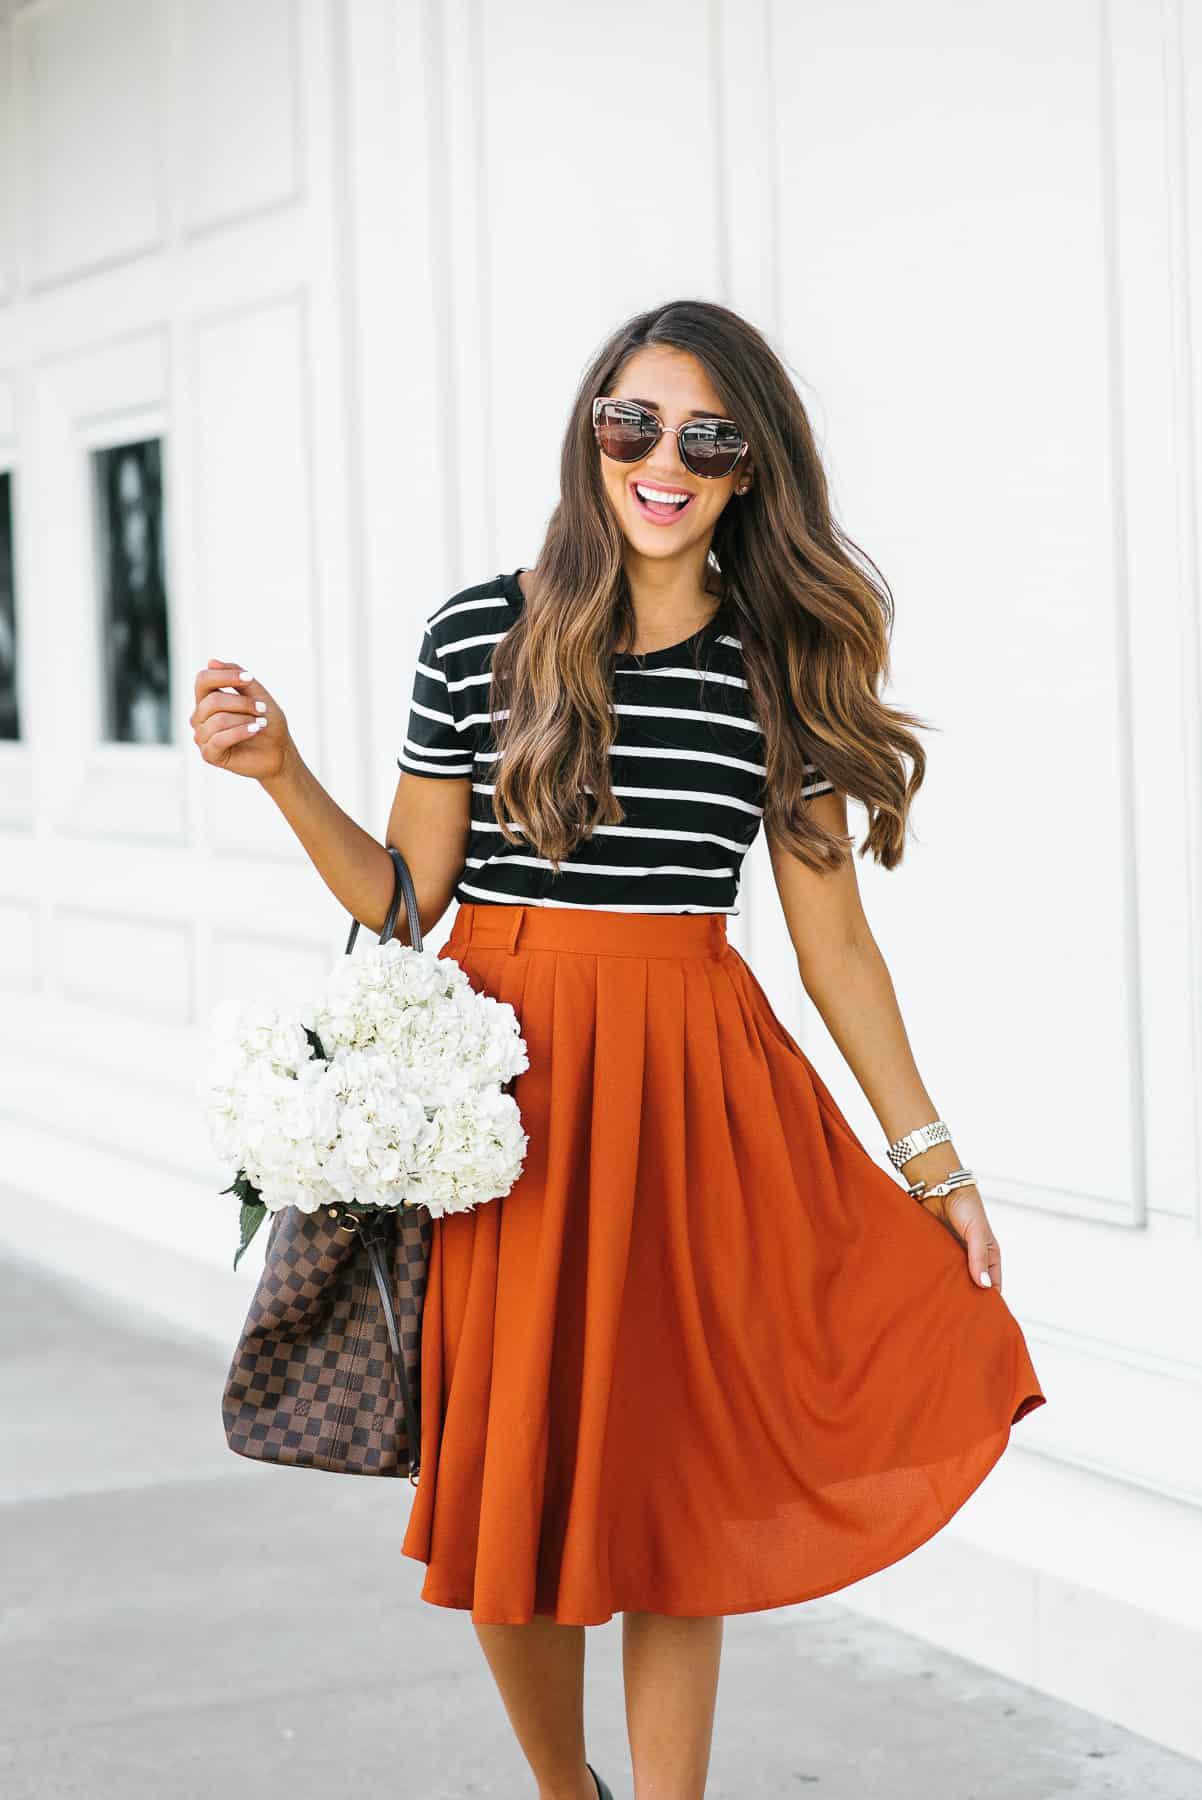 Mod Cloth Skirt, Houston, Texas, summer skirt, houston fashion, fashion blogger, Dress up Buttercup